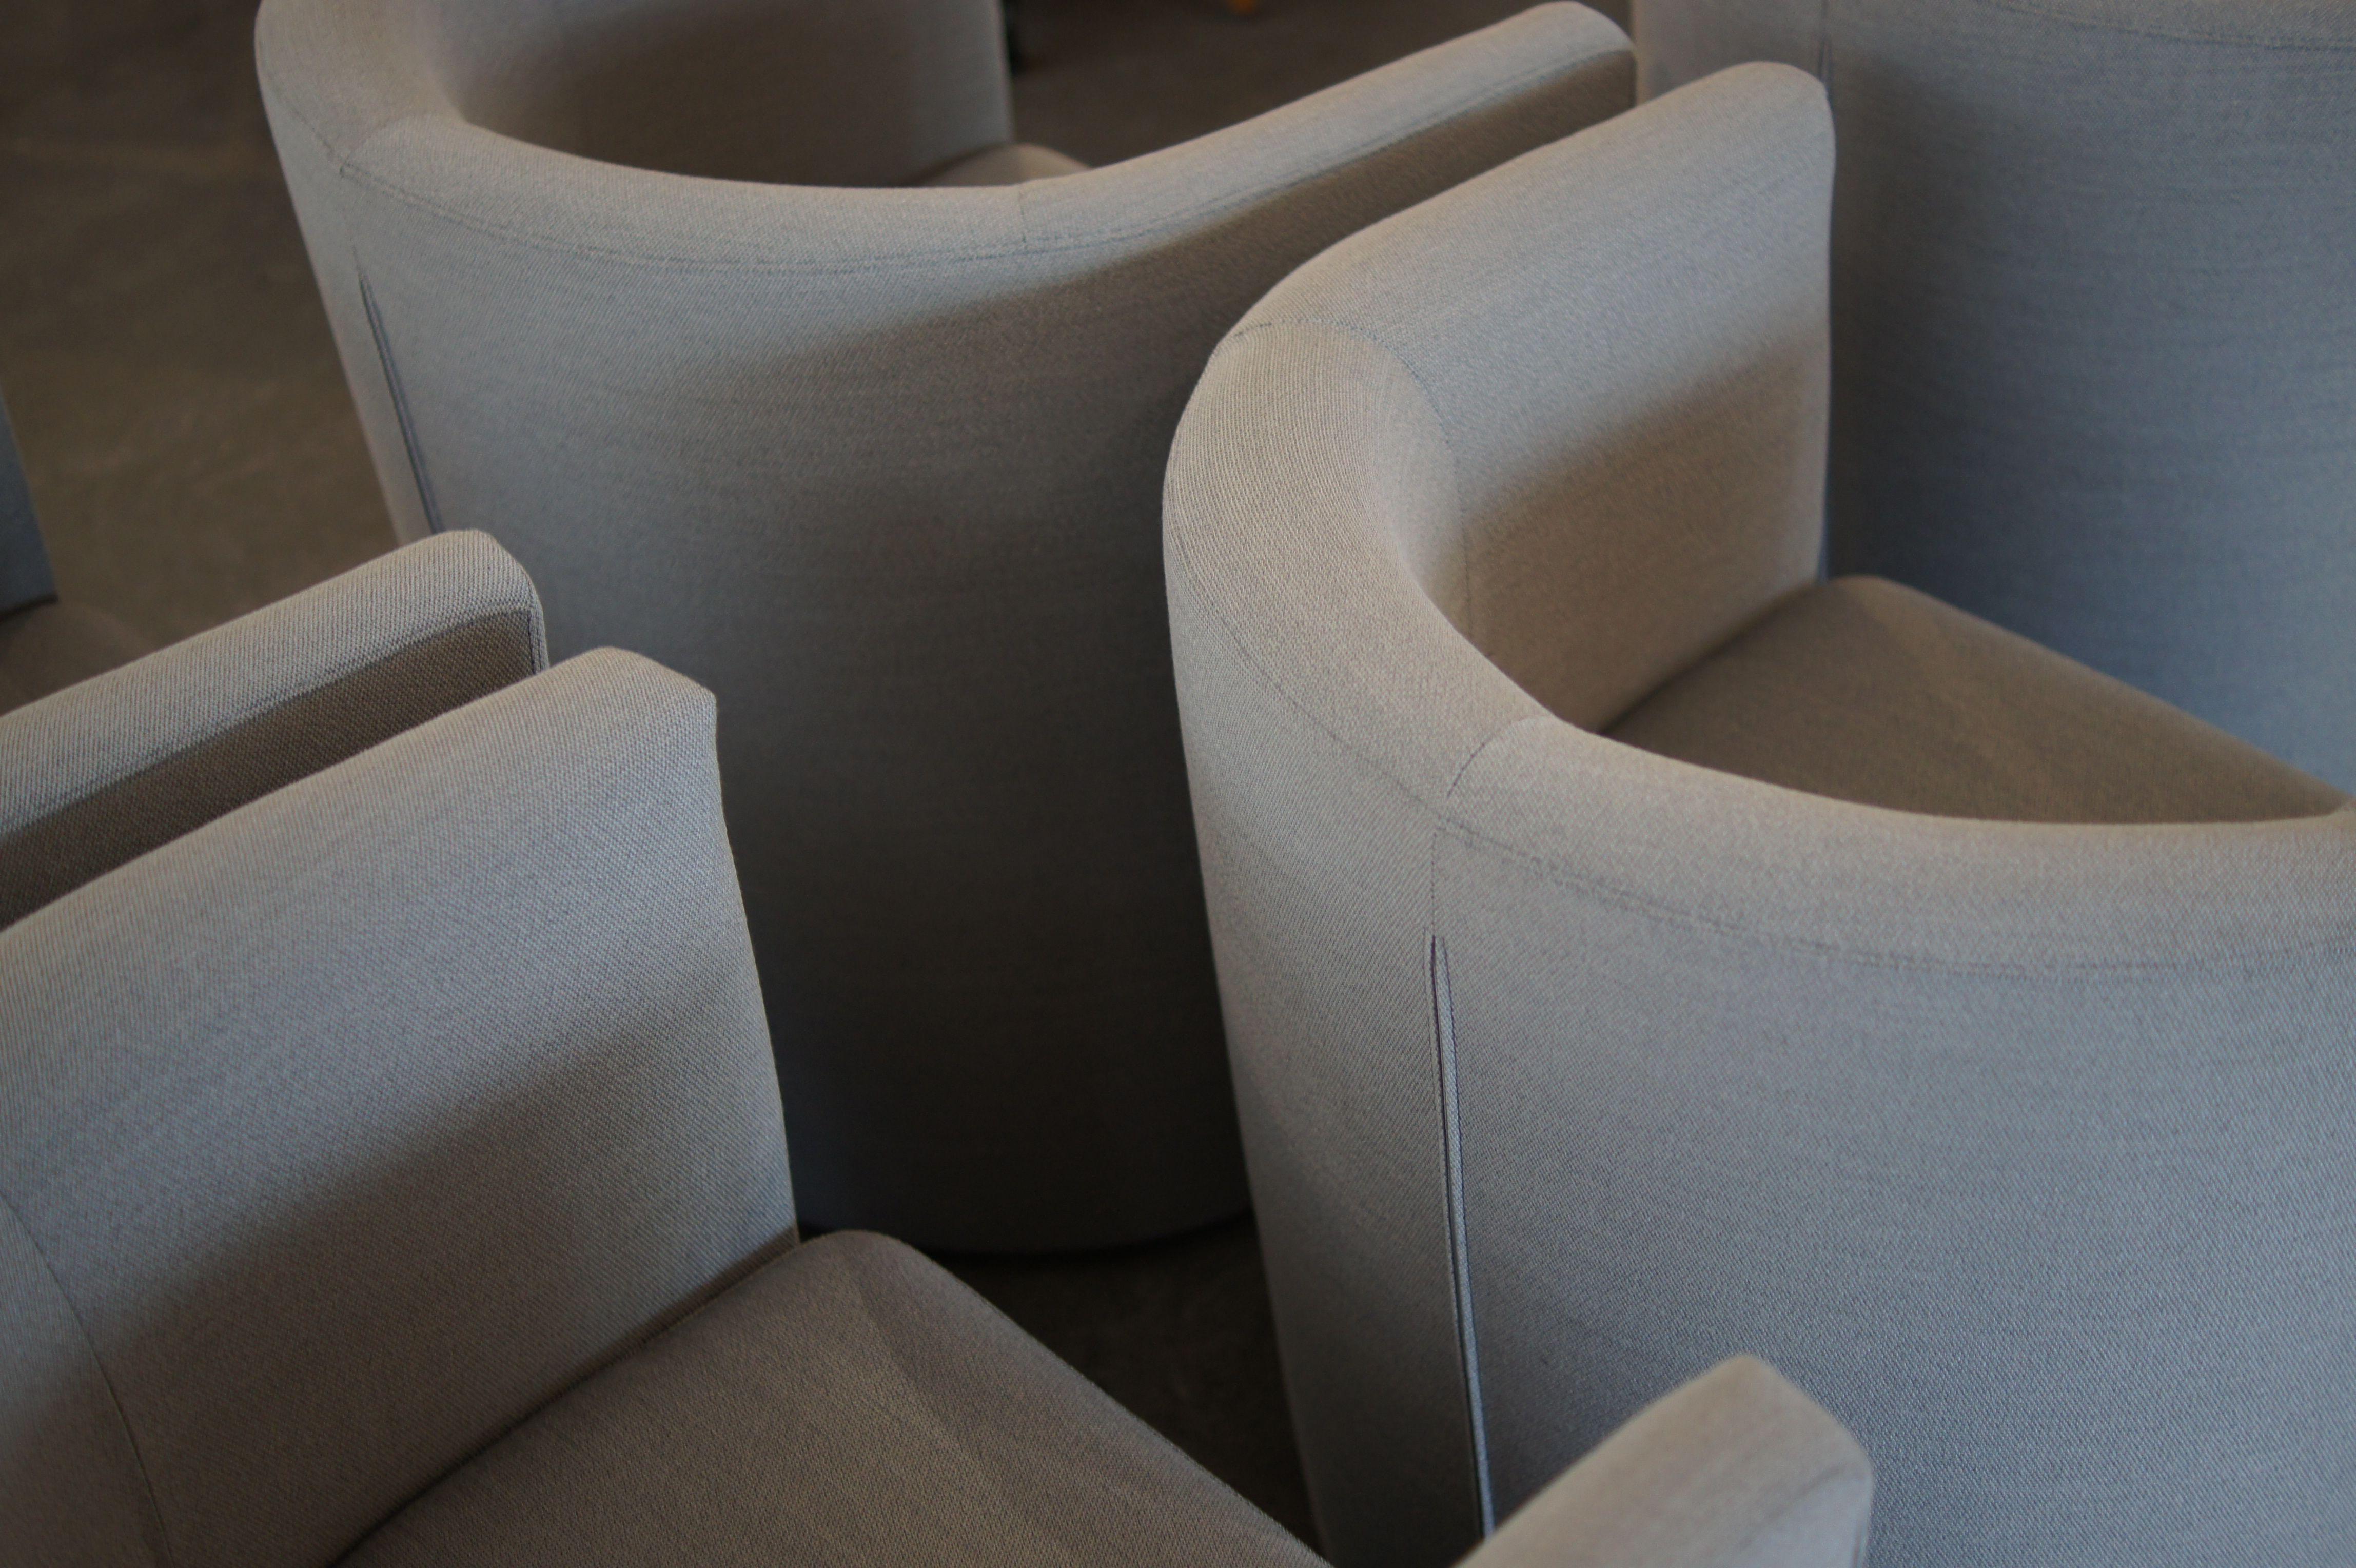 Referenzen Polstermobel Neu Bezogen Sessel Neu Beziehen Sessel Polsterei